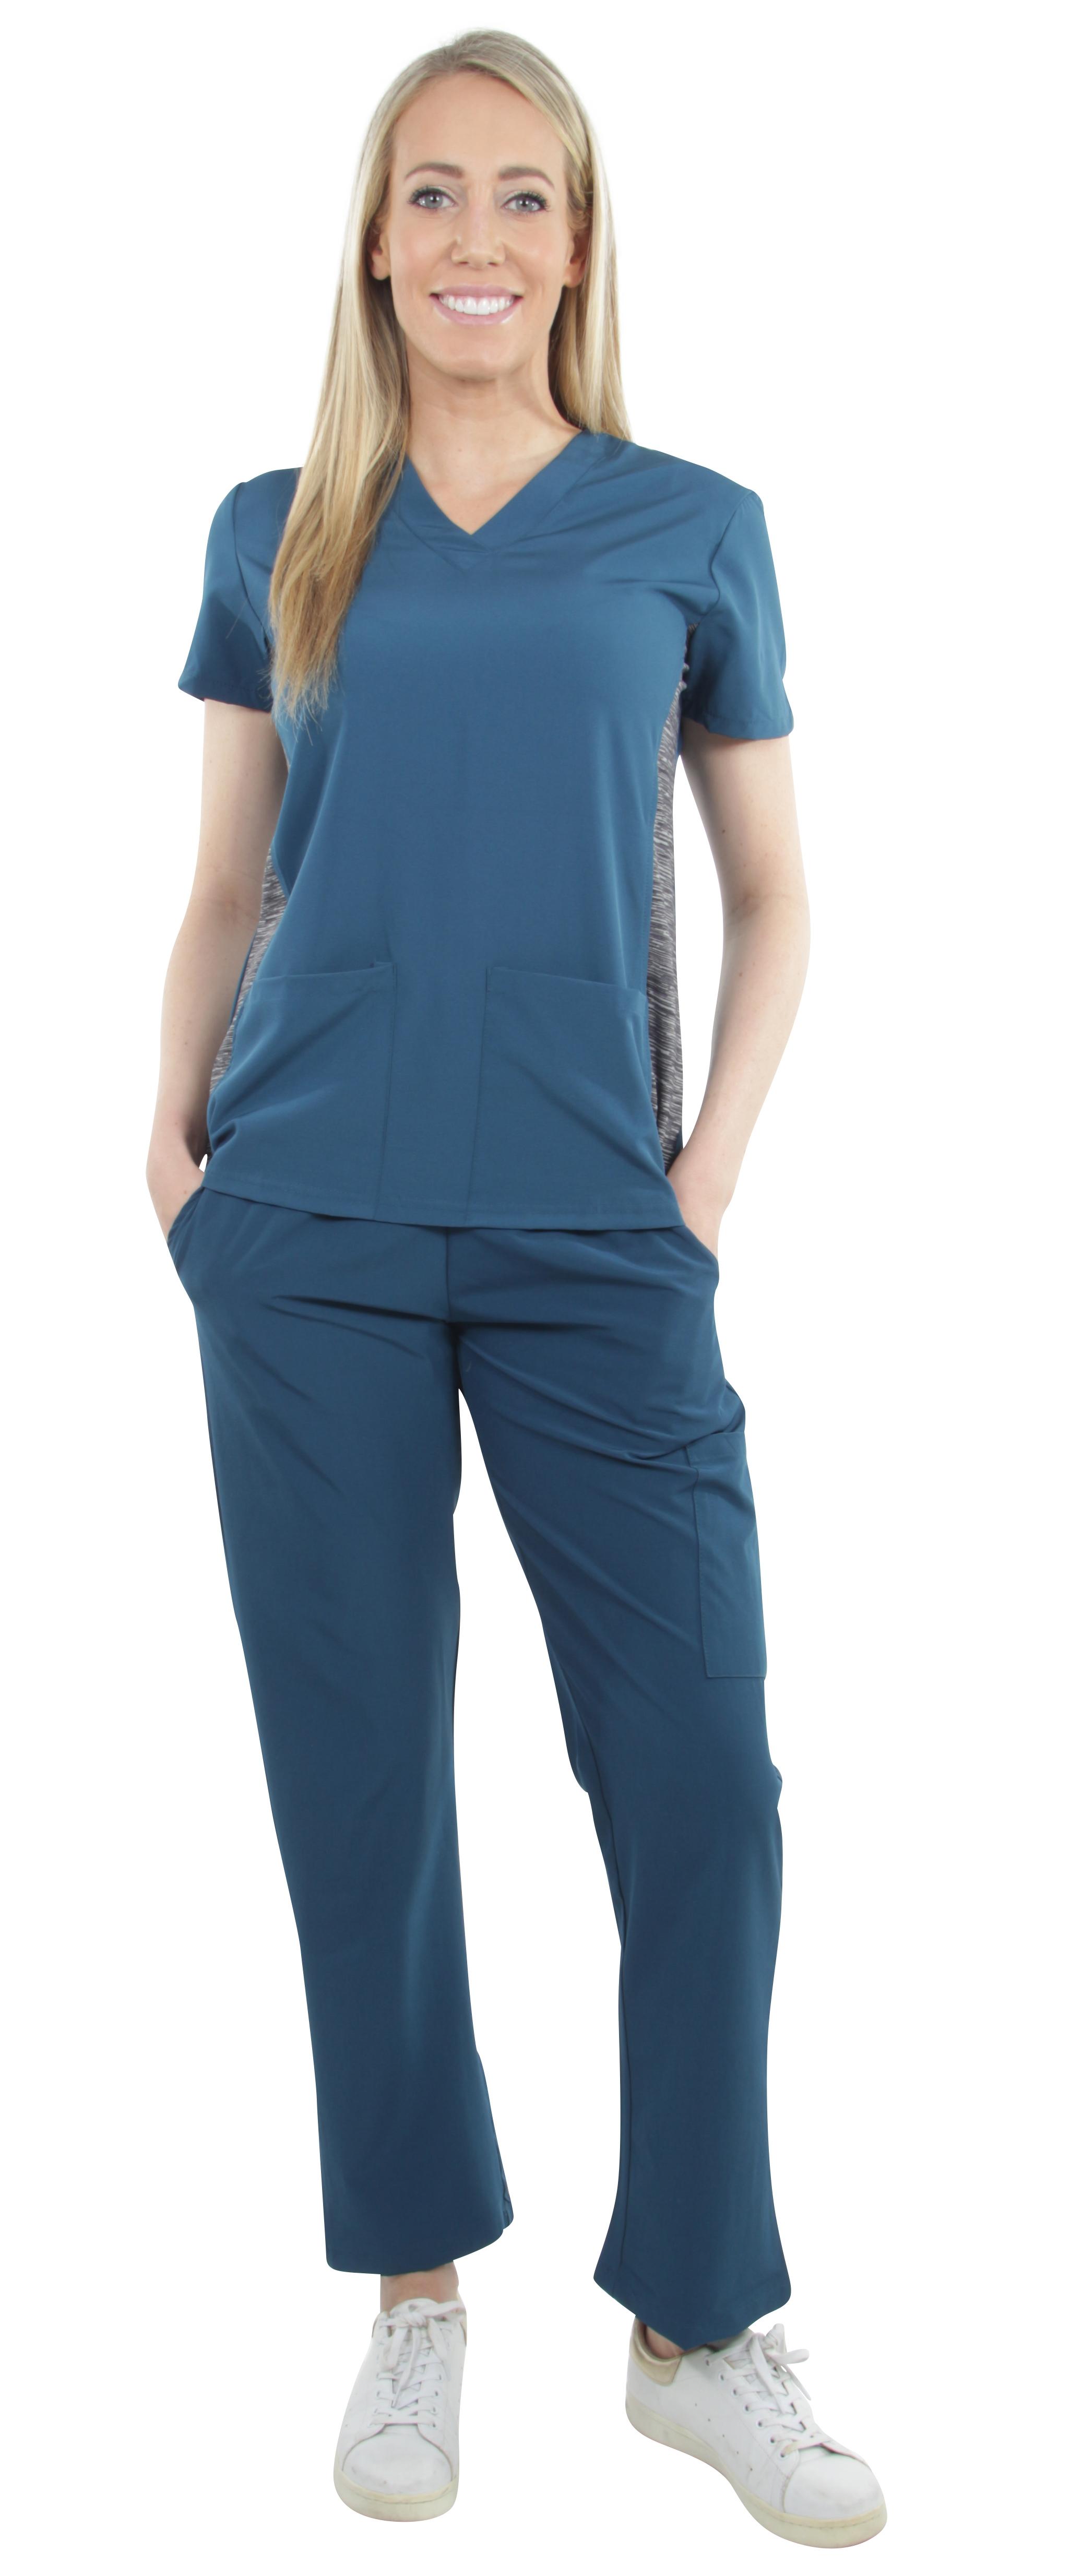 Unisex-Performance-Stretch-Medical-Uniform-Five-Pockets-V-Neck-Scrubs-Sets miniature 20